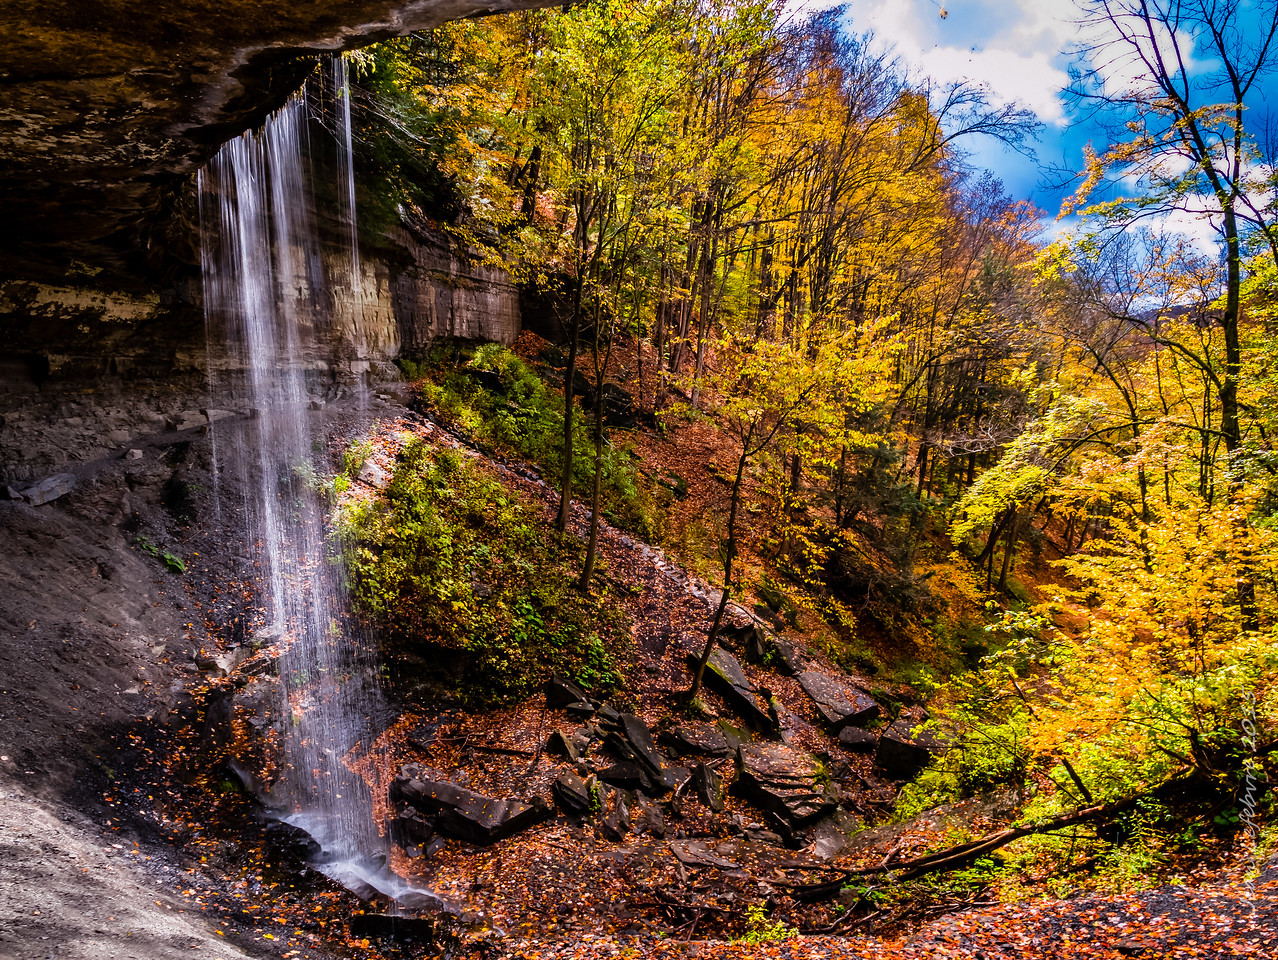 Tinker Falls, New York